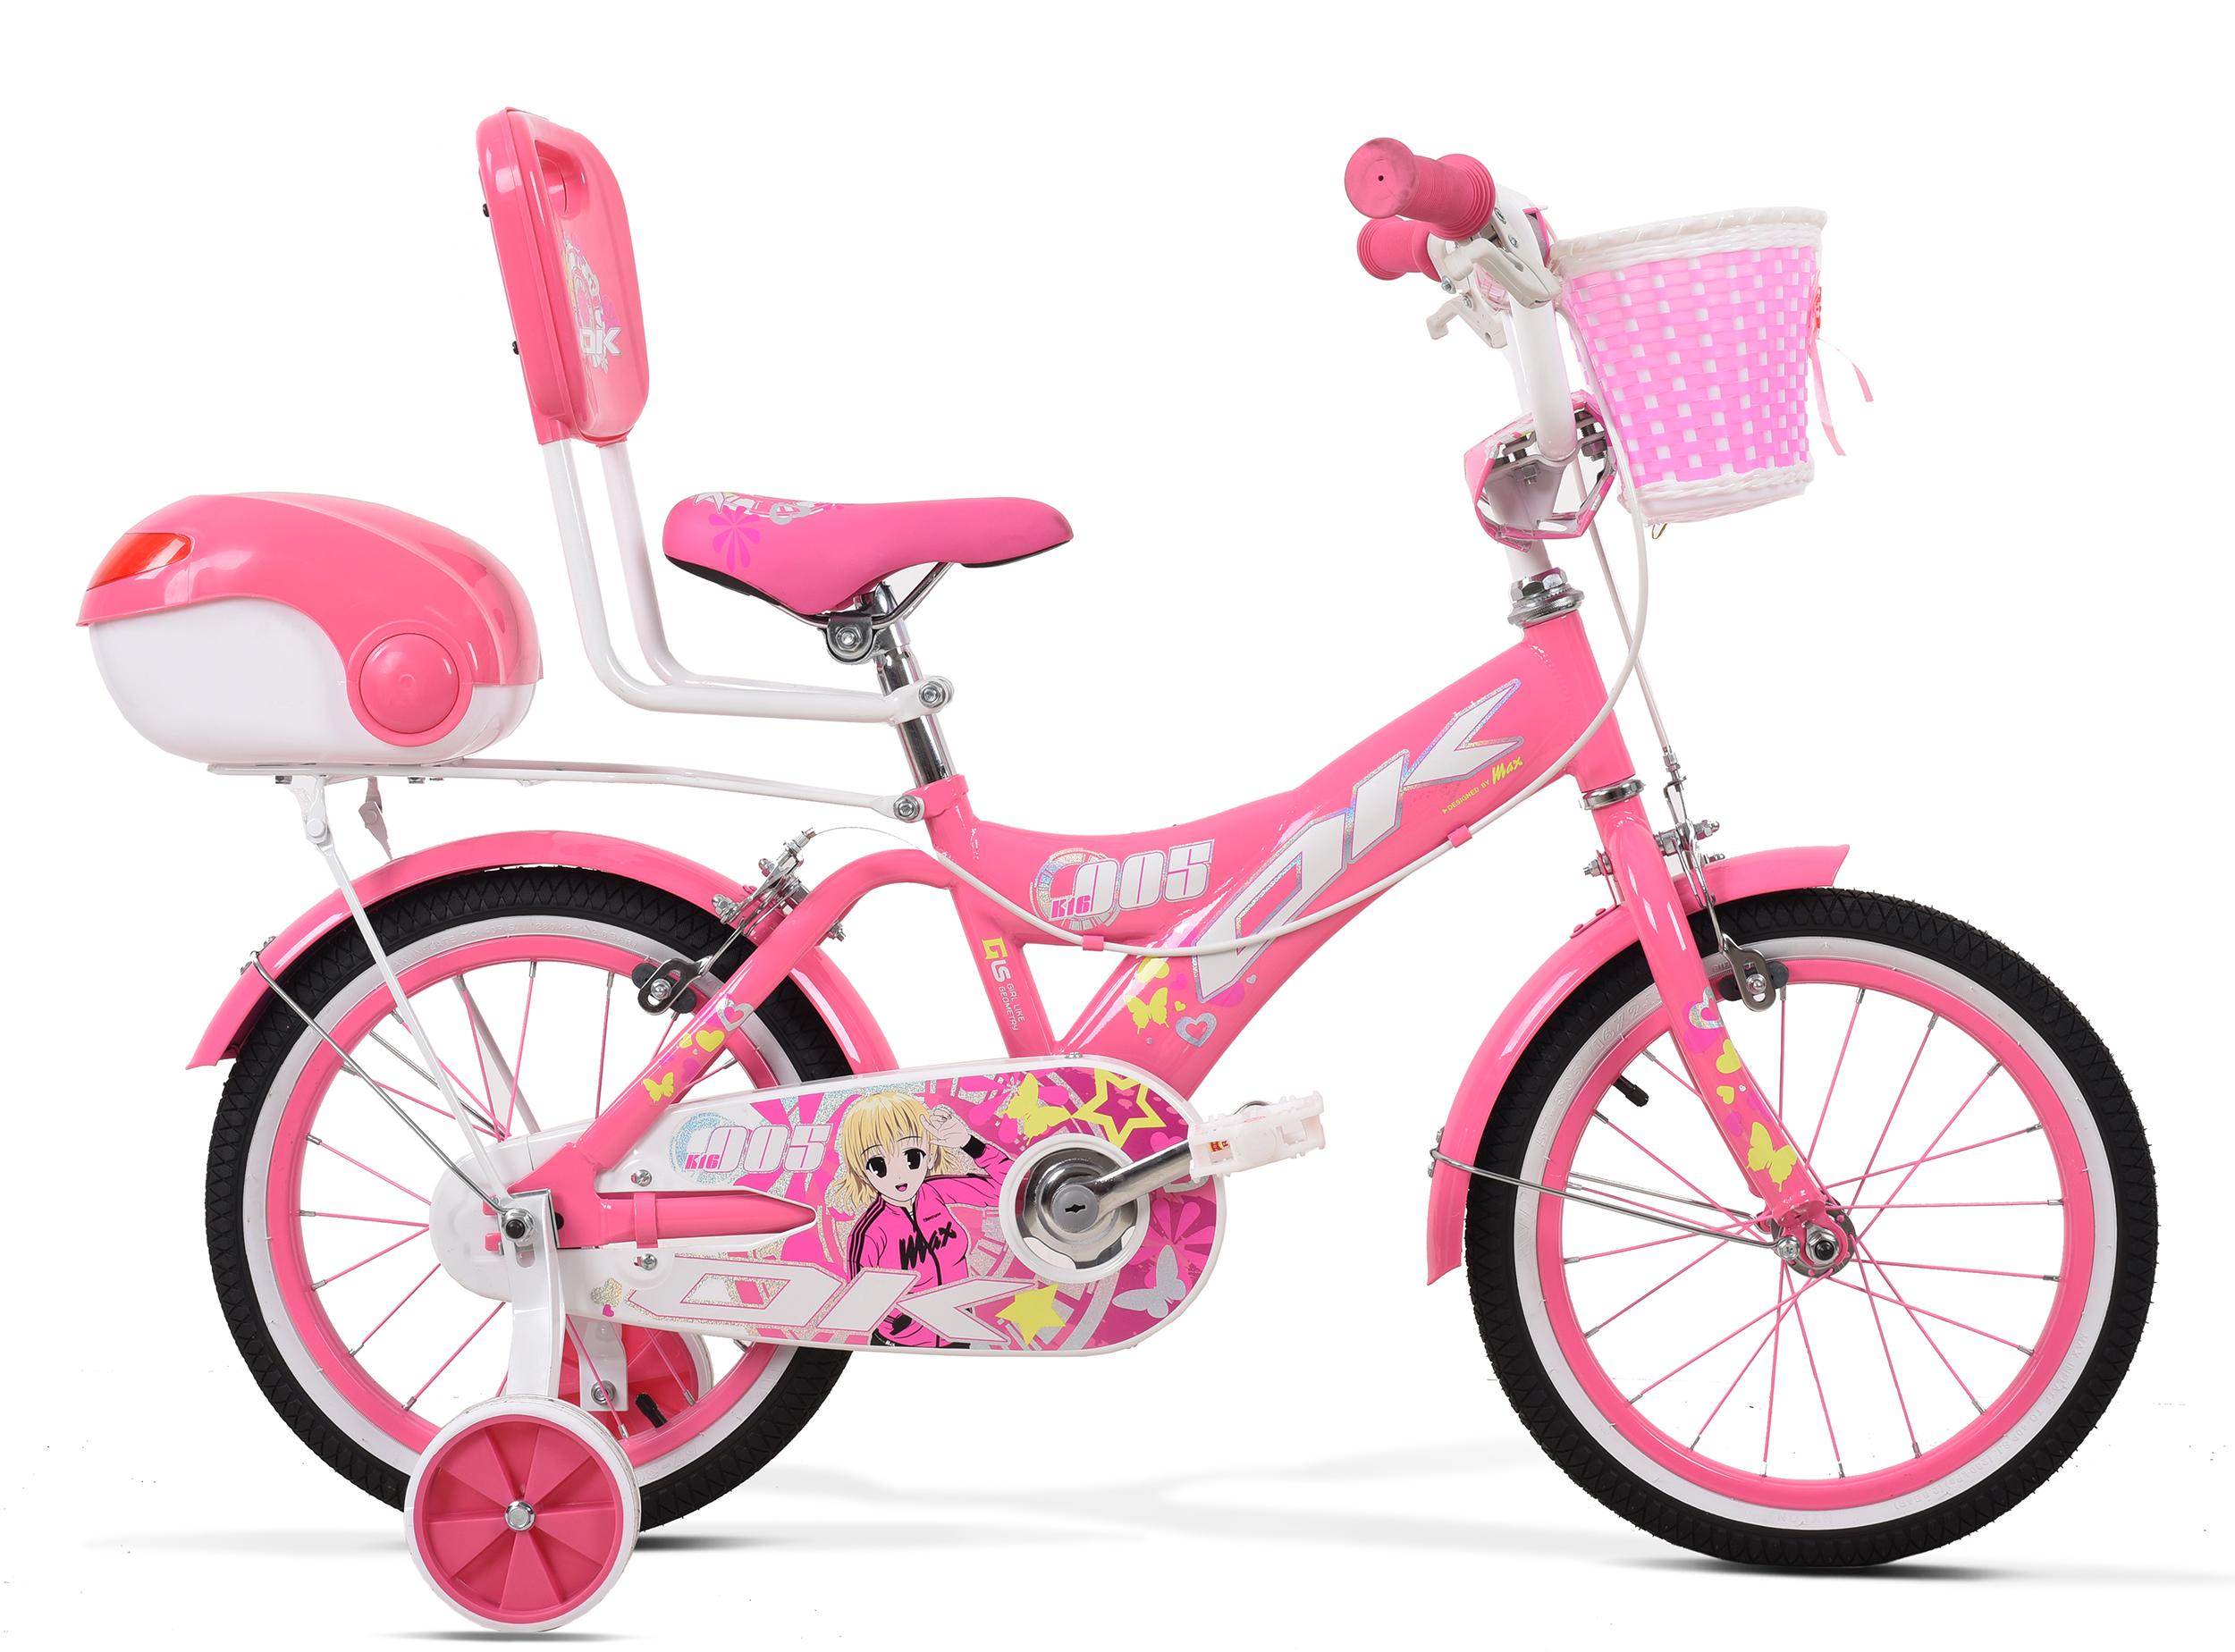 دوچرخه سایز 16 مدل K16005HR